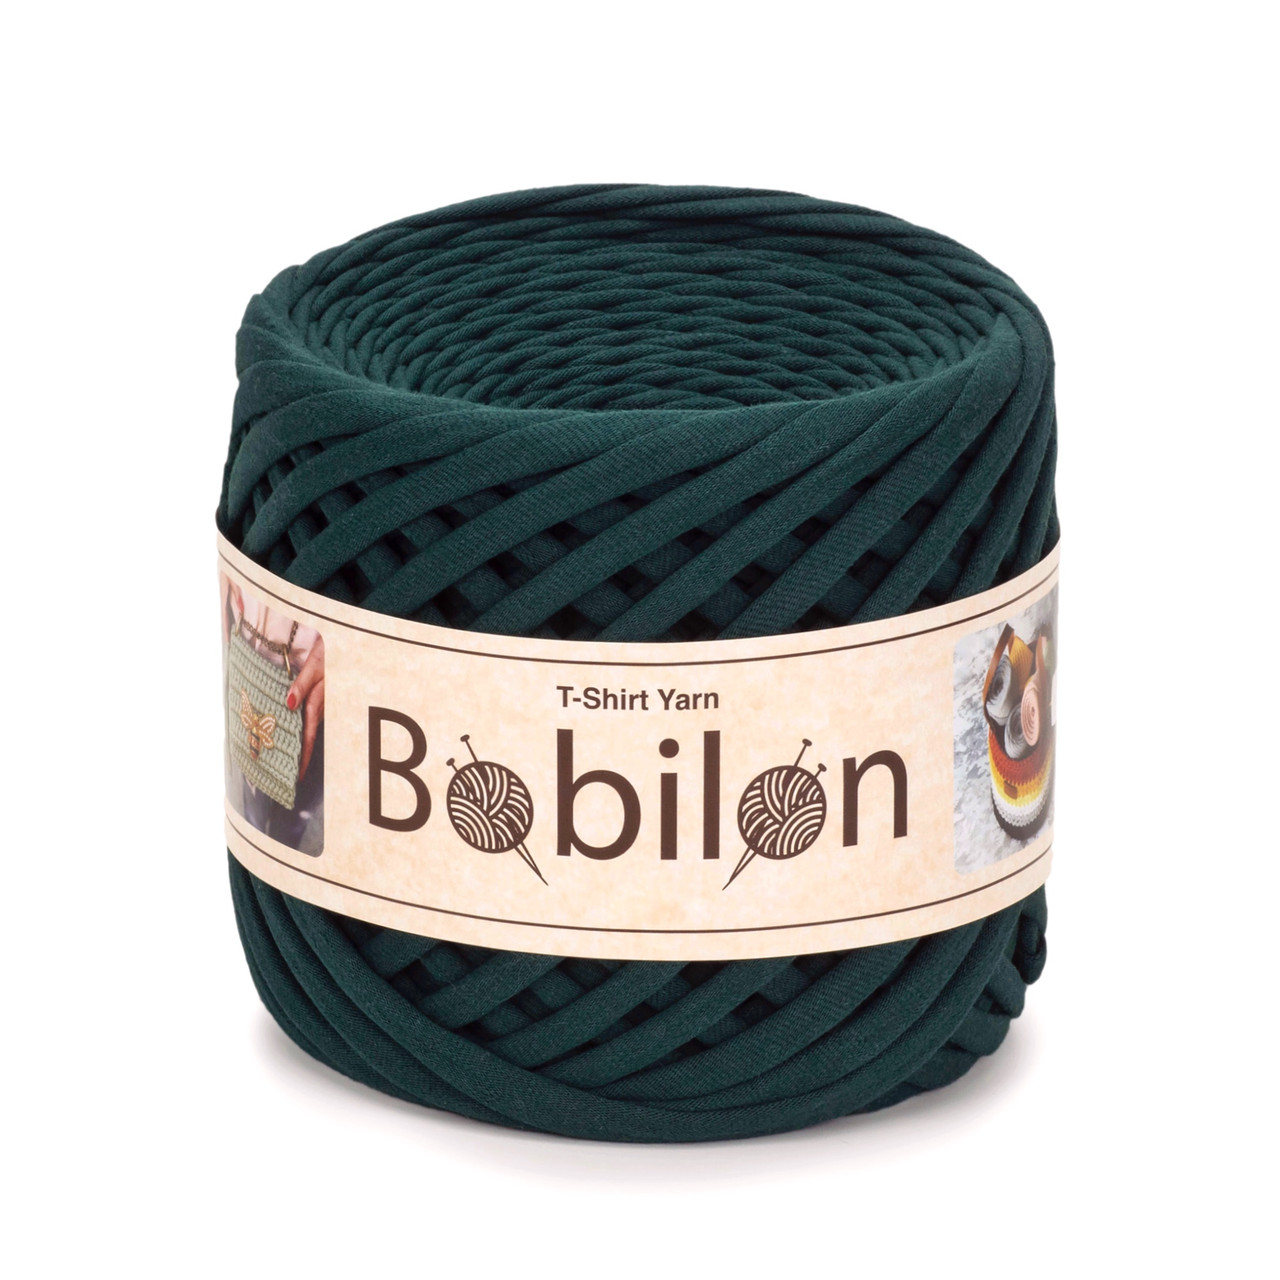 Трикотажная пряжа Bobilon Maxi (9-11 мм) Ultramarine Green Темно-зеленый